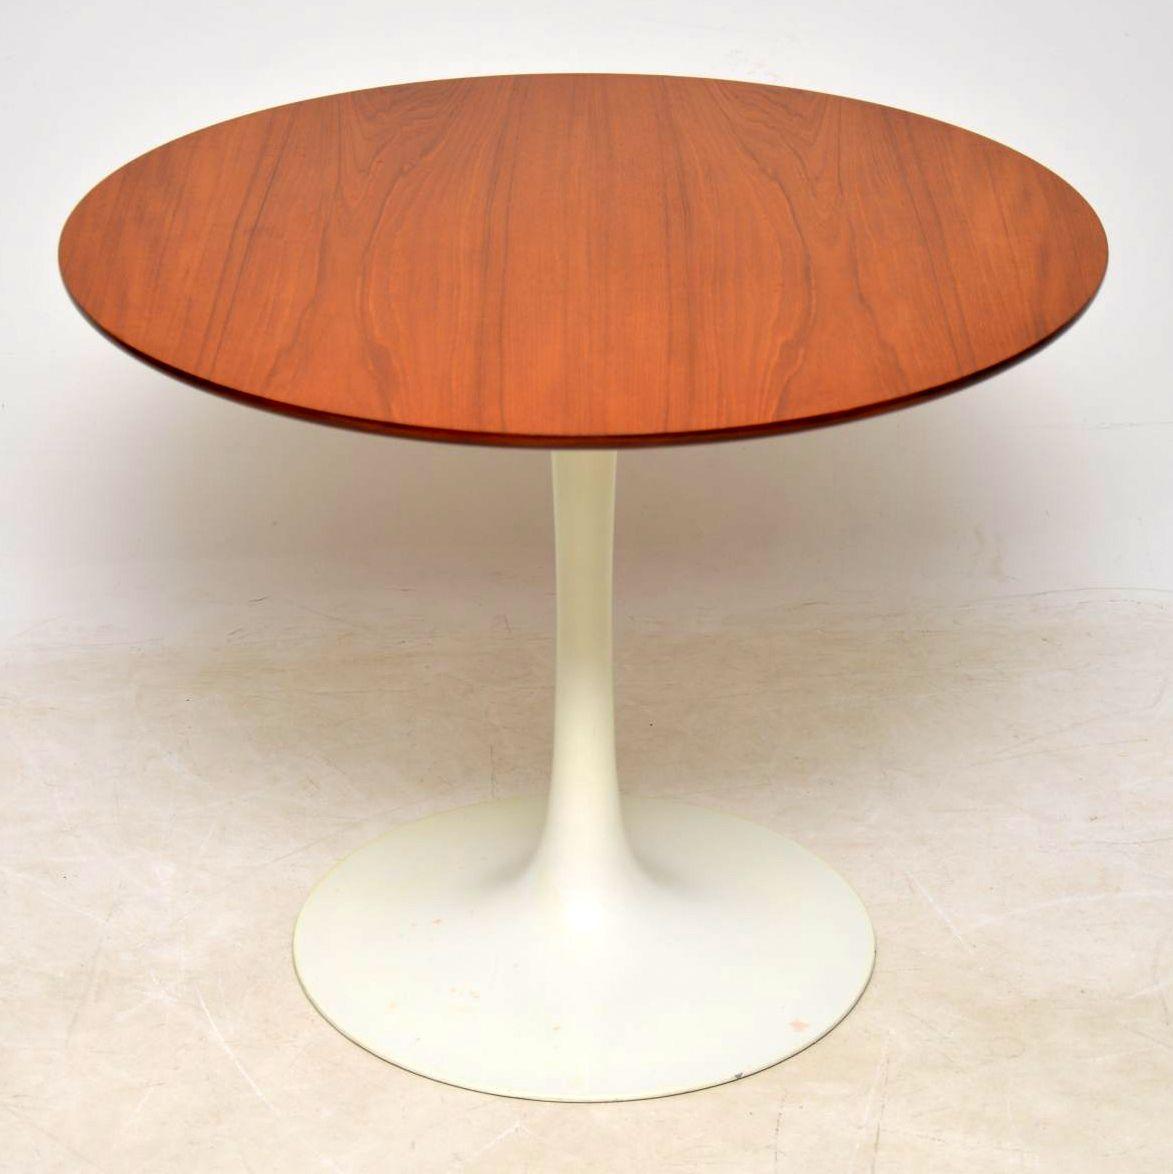 1960's Teak Vintage Tulip Dining Table by Arkana